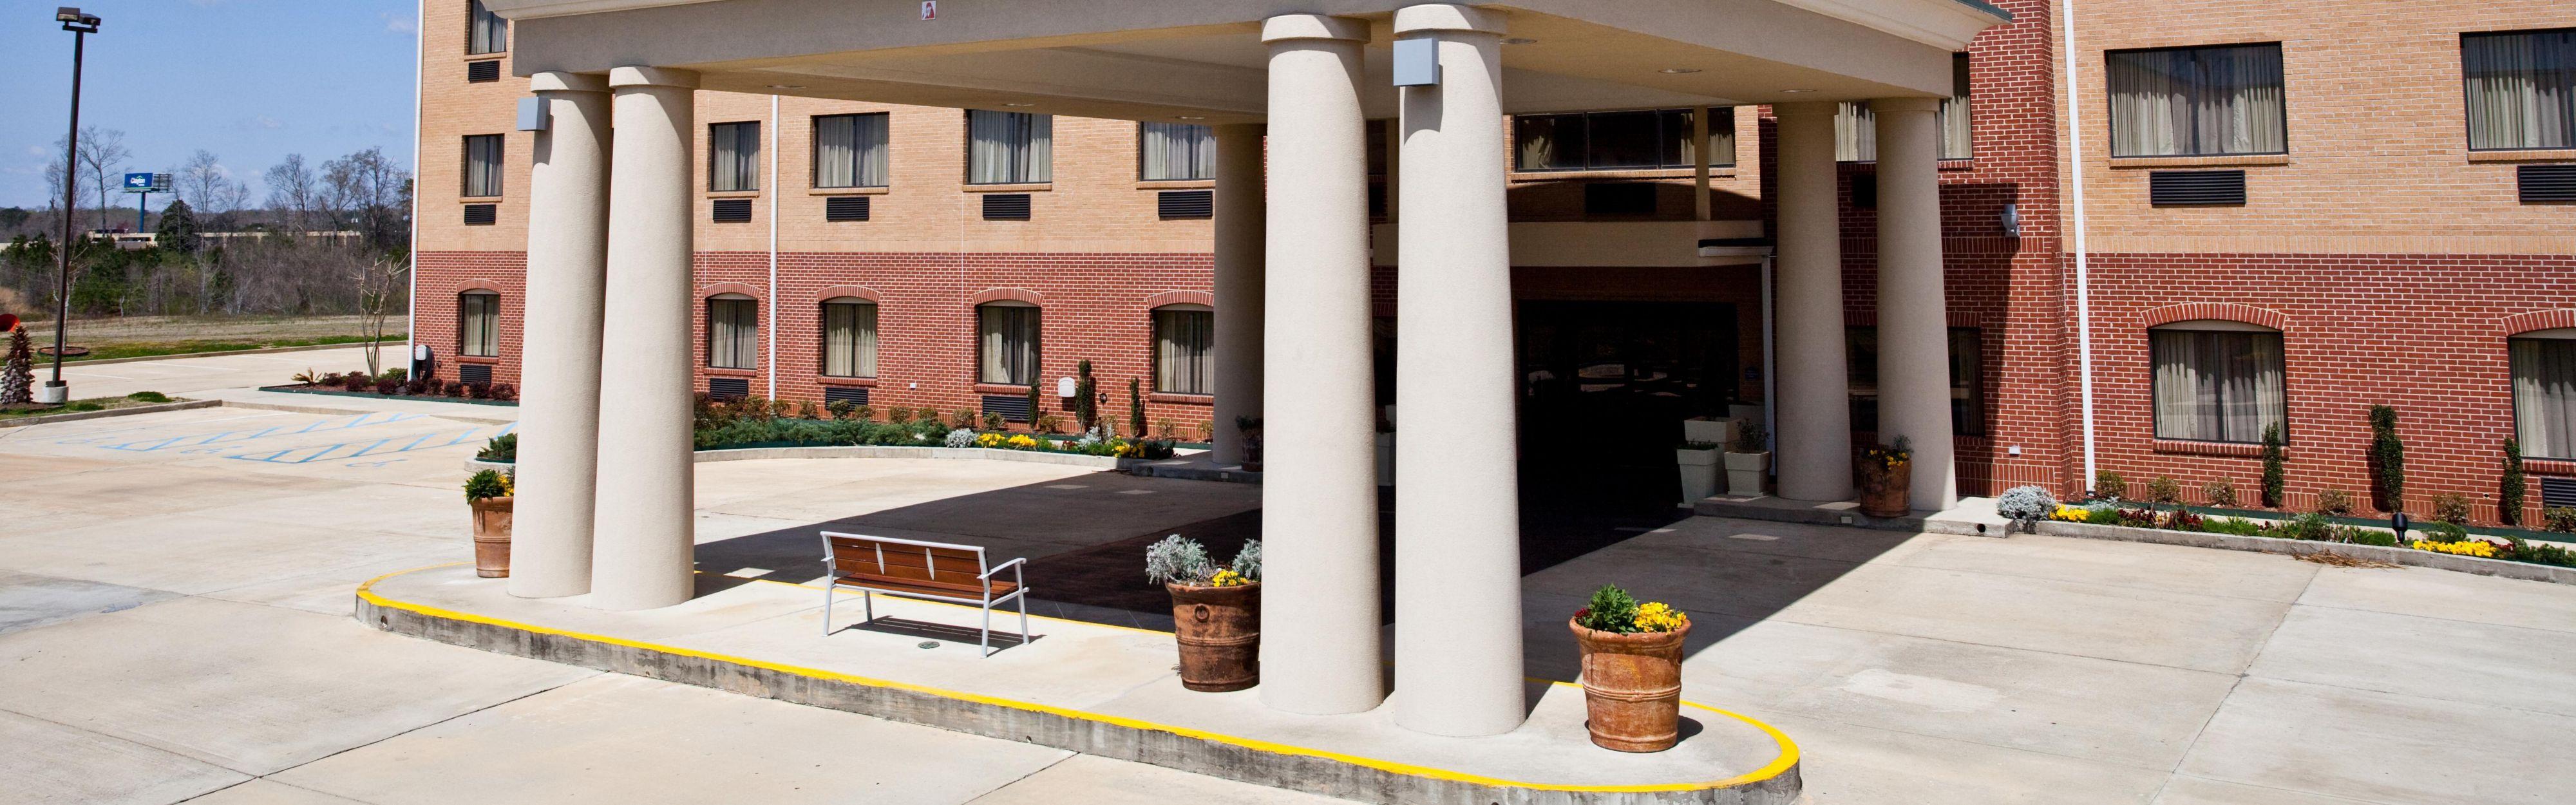 Holiday Inn Express Clanton image 0